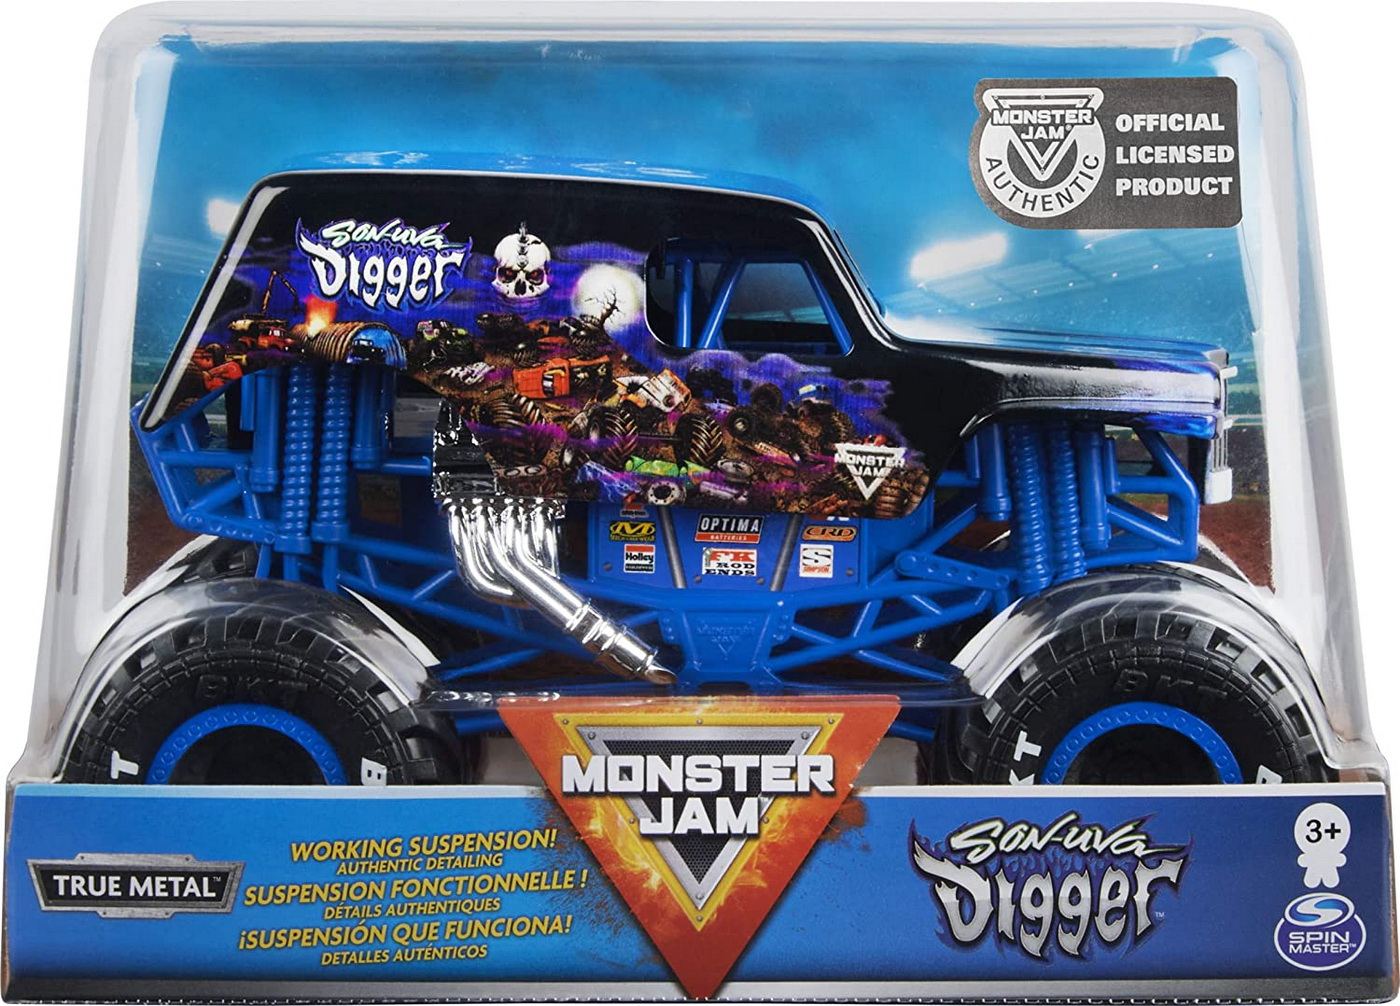 Monster Jam Macheta Metalica Scara 1 La 24 Son-uva Digger